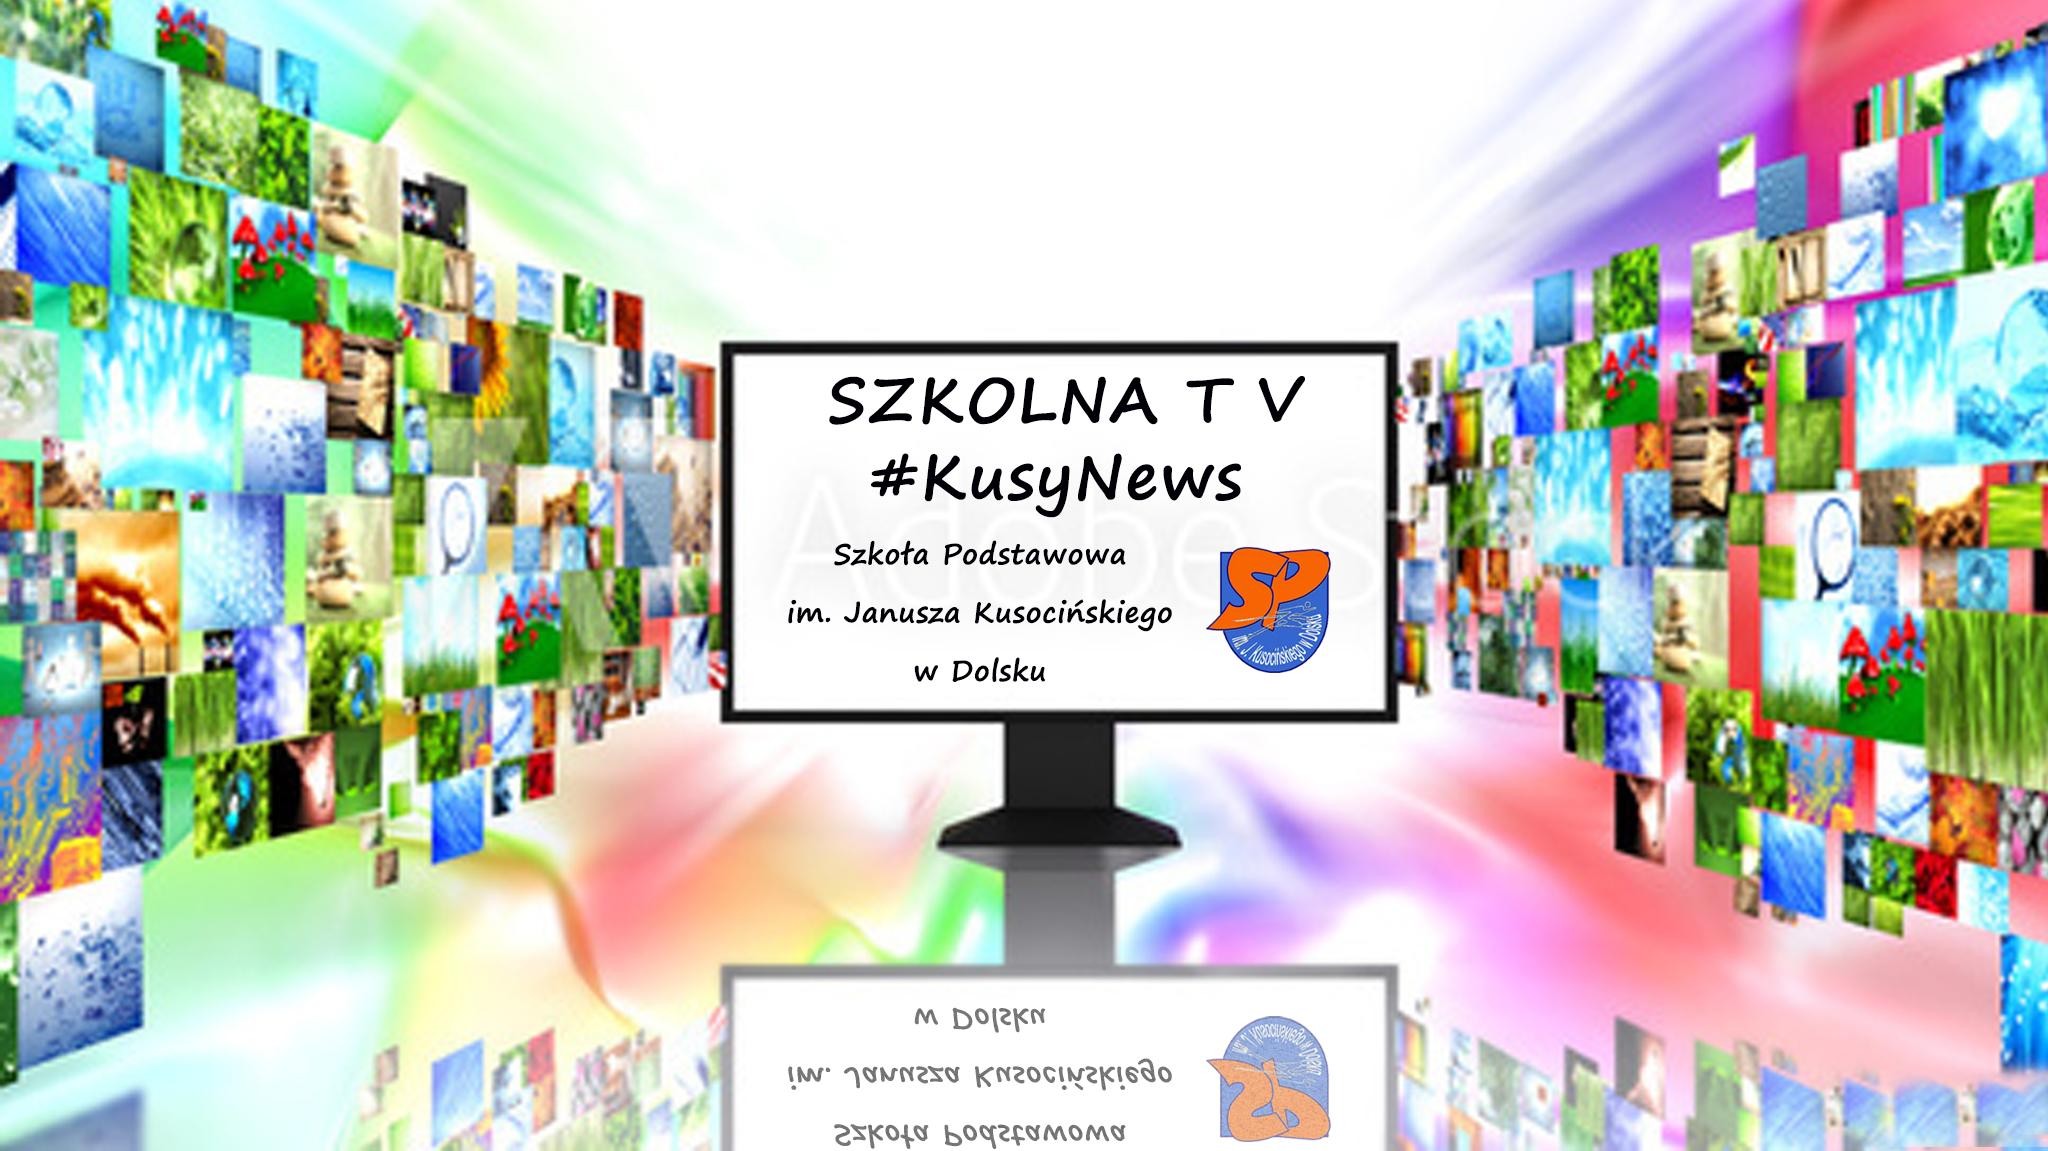 Szkolna Telewizja